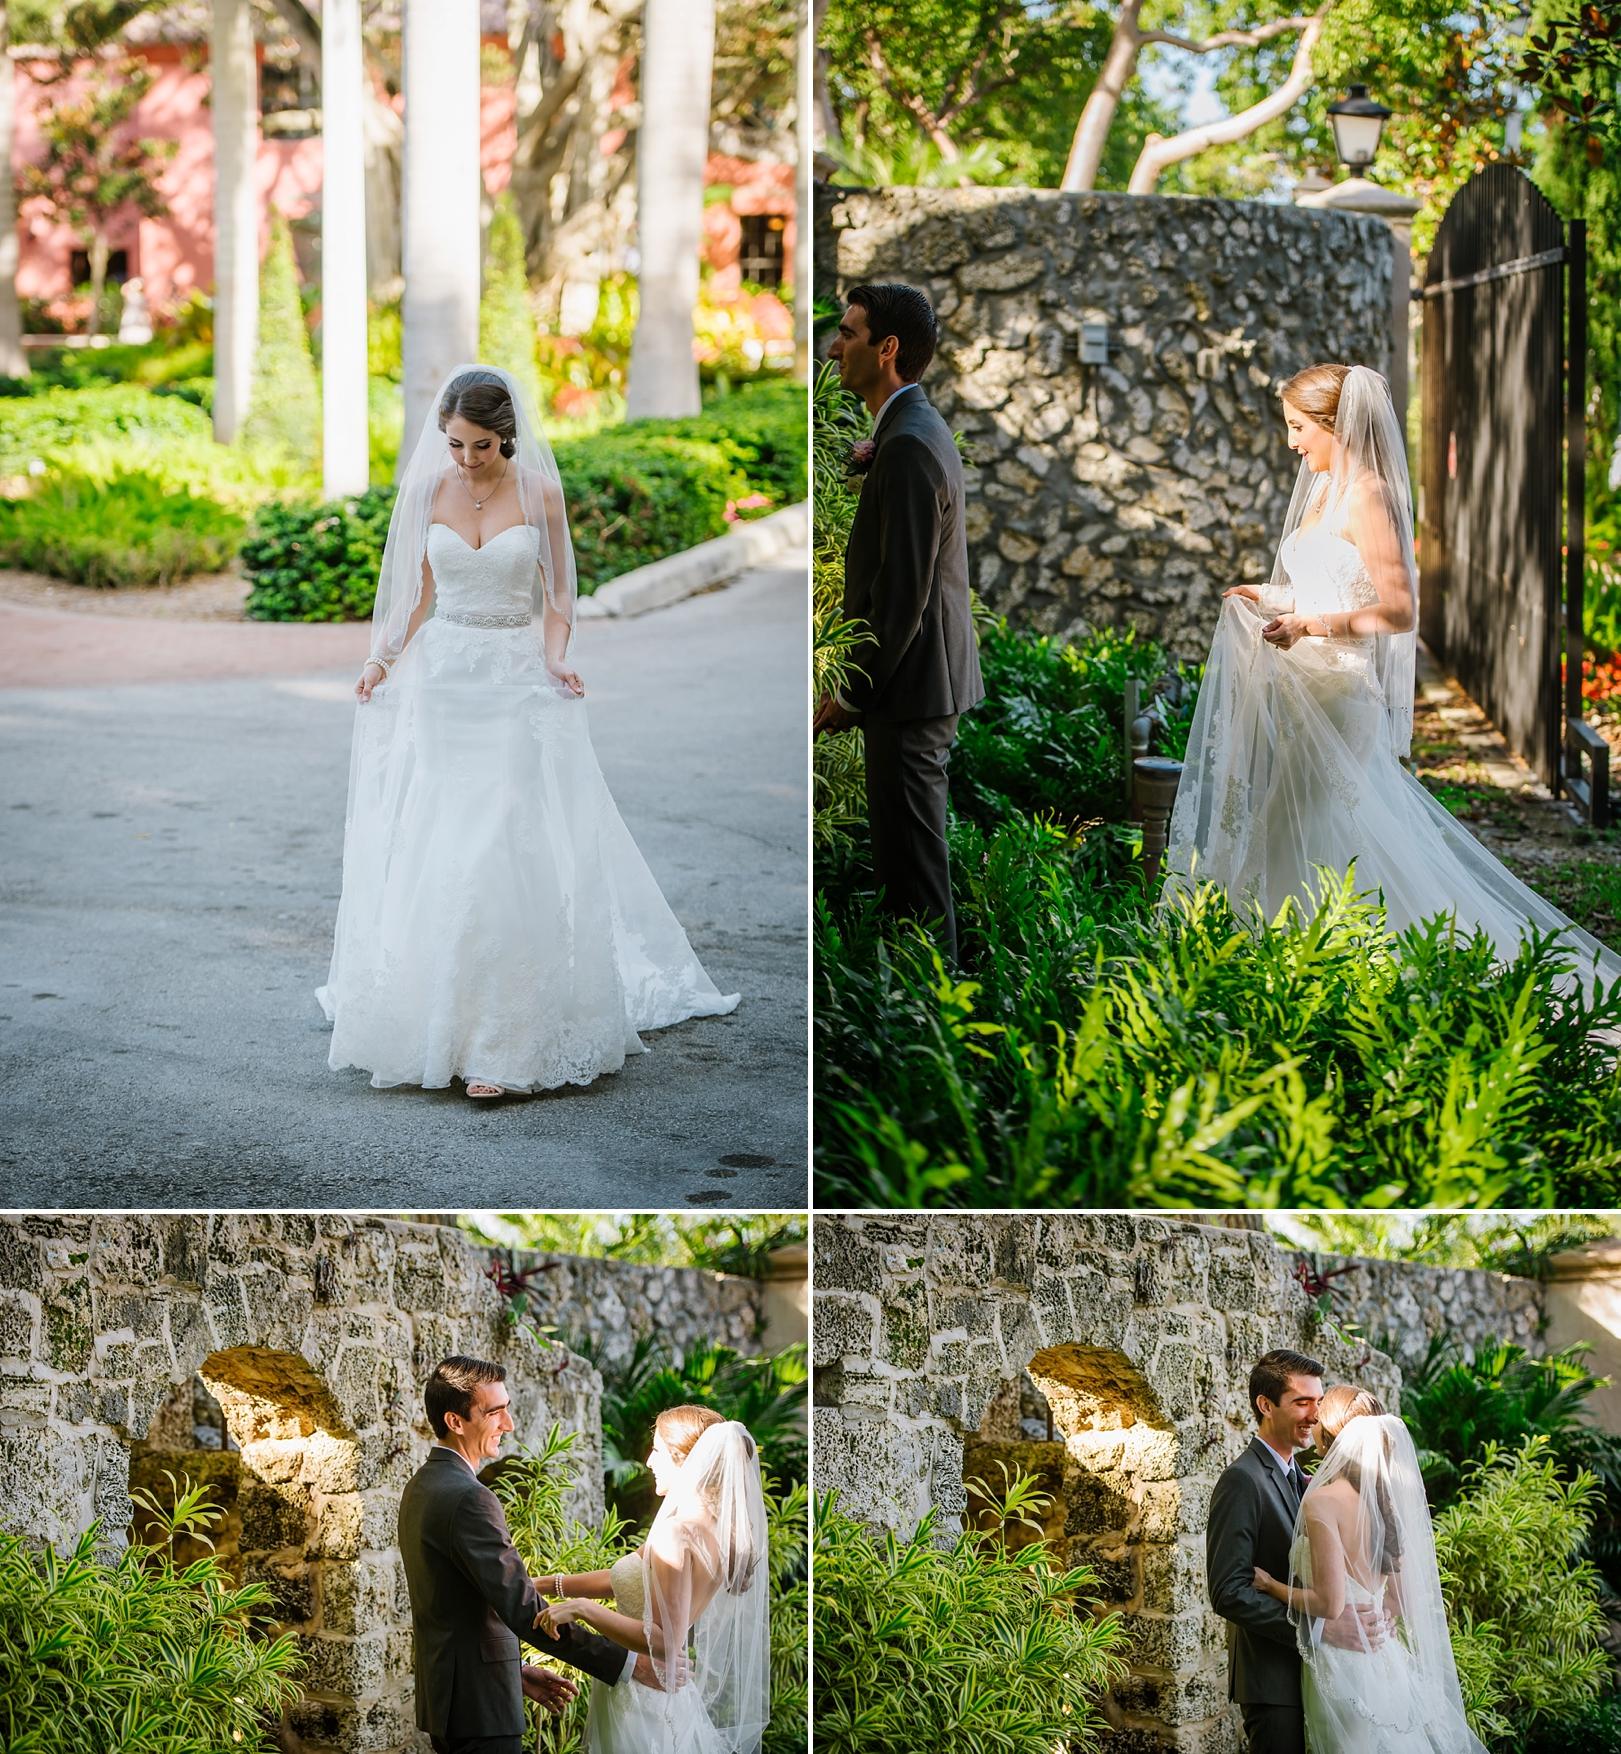 miami-wedding-photography-ashlee-hamon-elegant-vintage-antique-wedding_0006.jpg